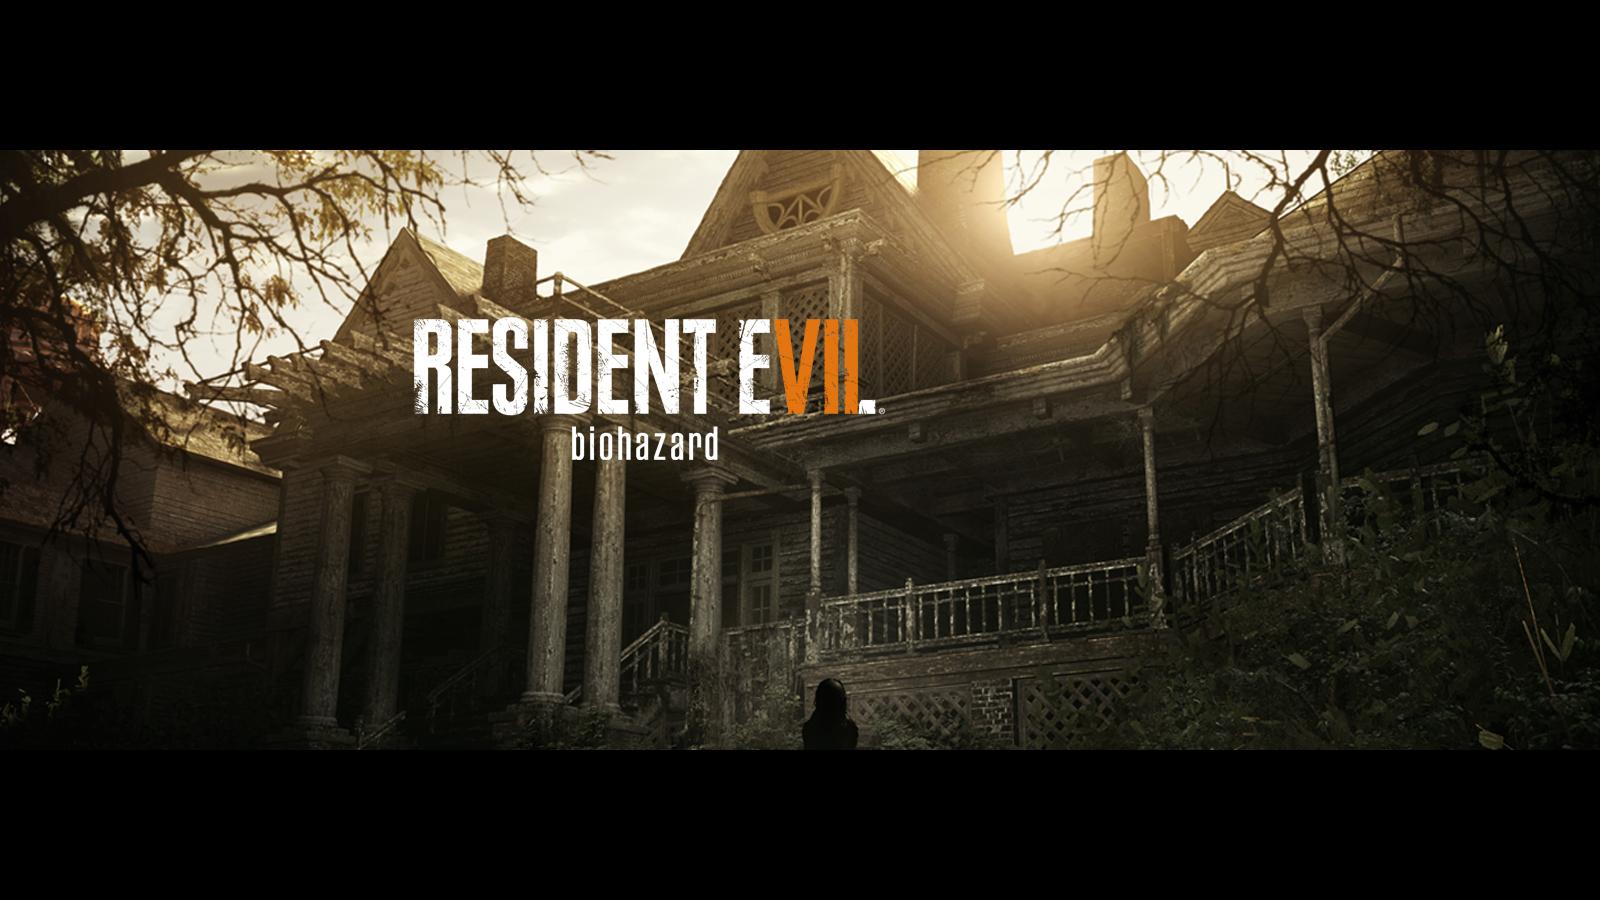 Resident Evil 7 Biohazard Wallpapers Video Game Hq Resident